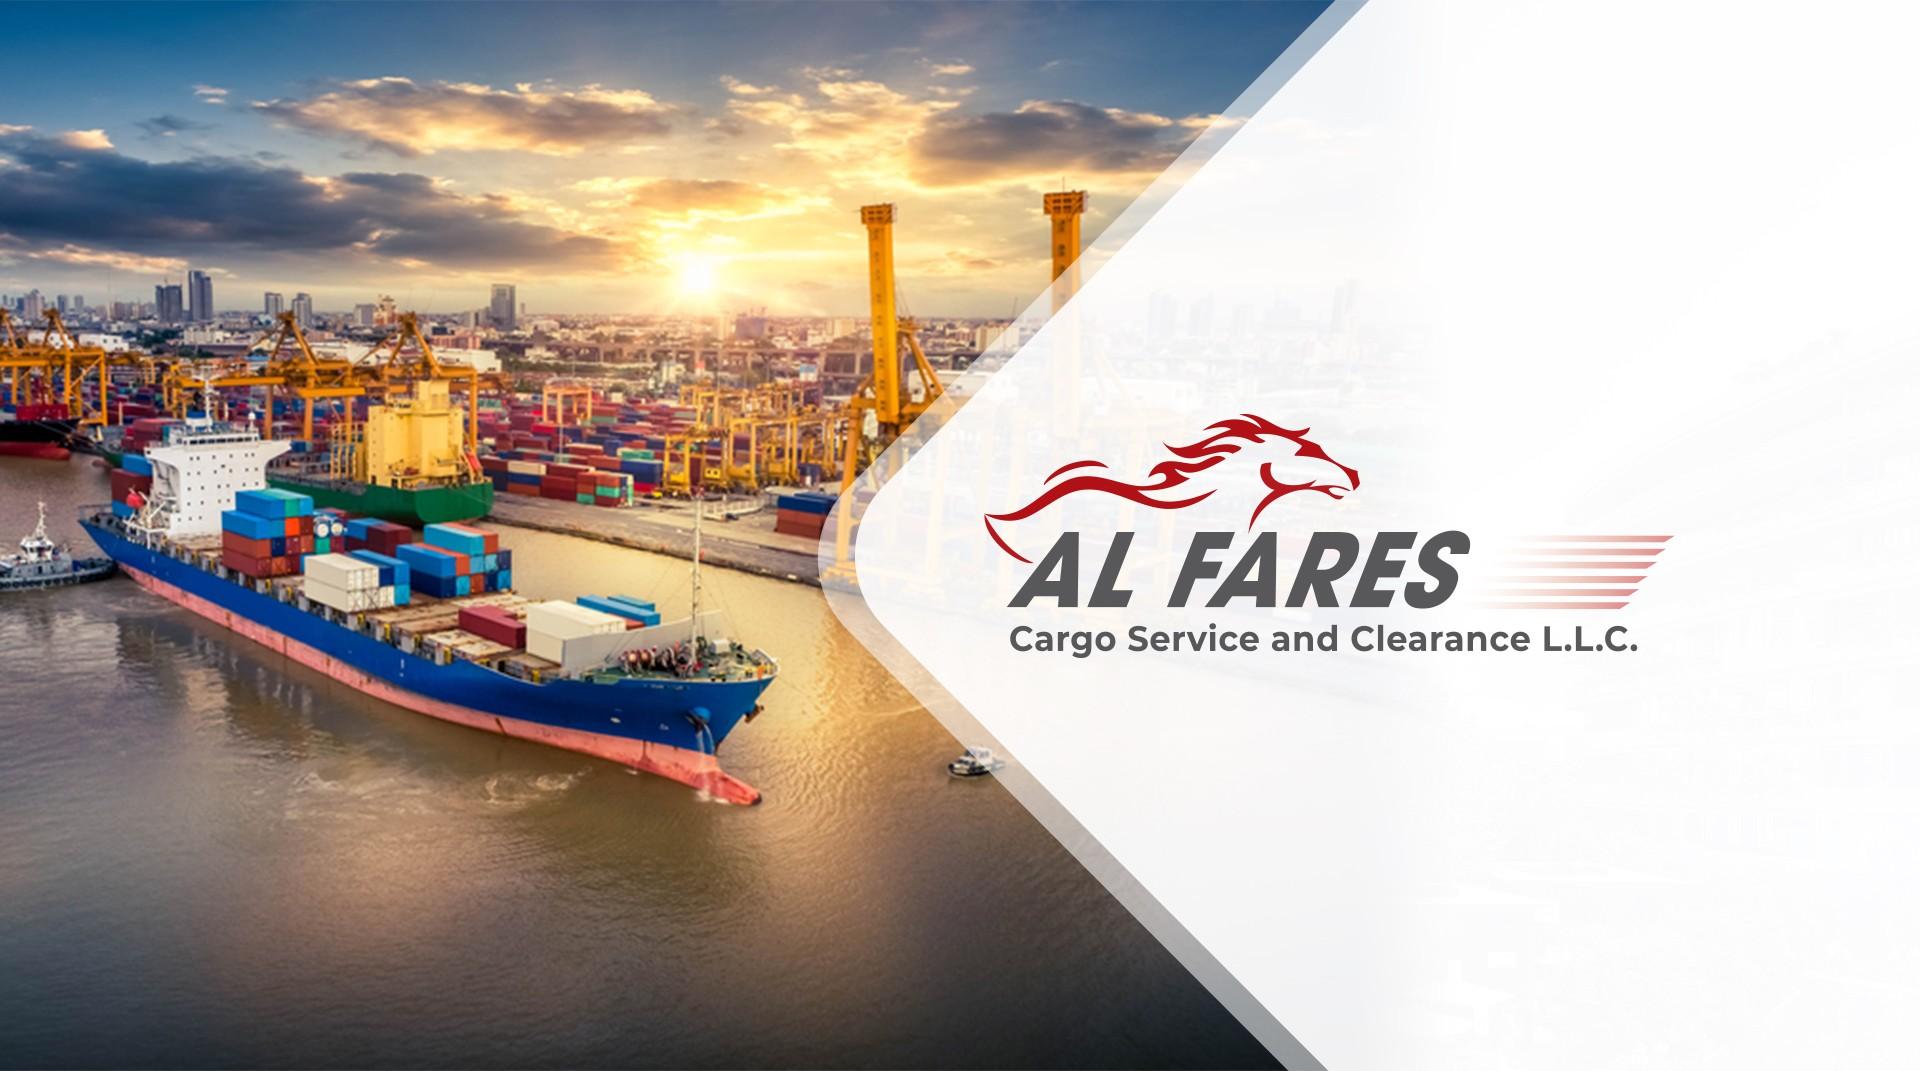 Al Fares Cargo Service & Clearance   LinkedIn